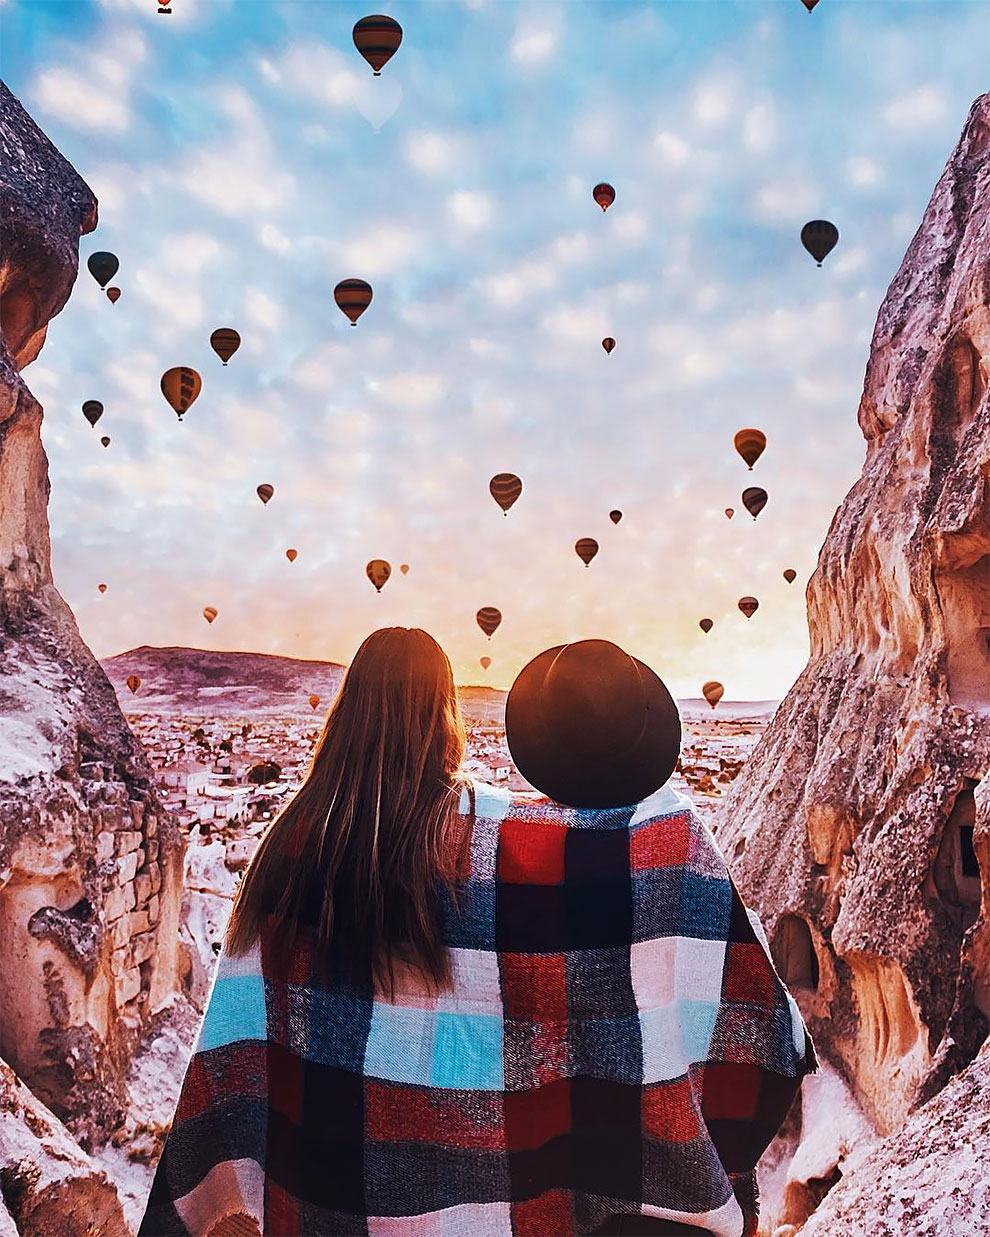 Unreal Hot Air Balloons Captured In Cappadocia [Turkey